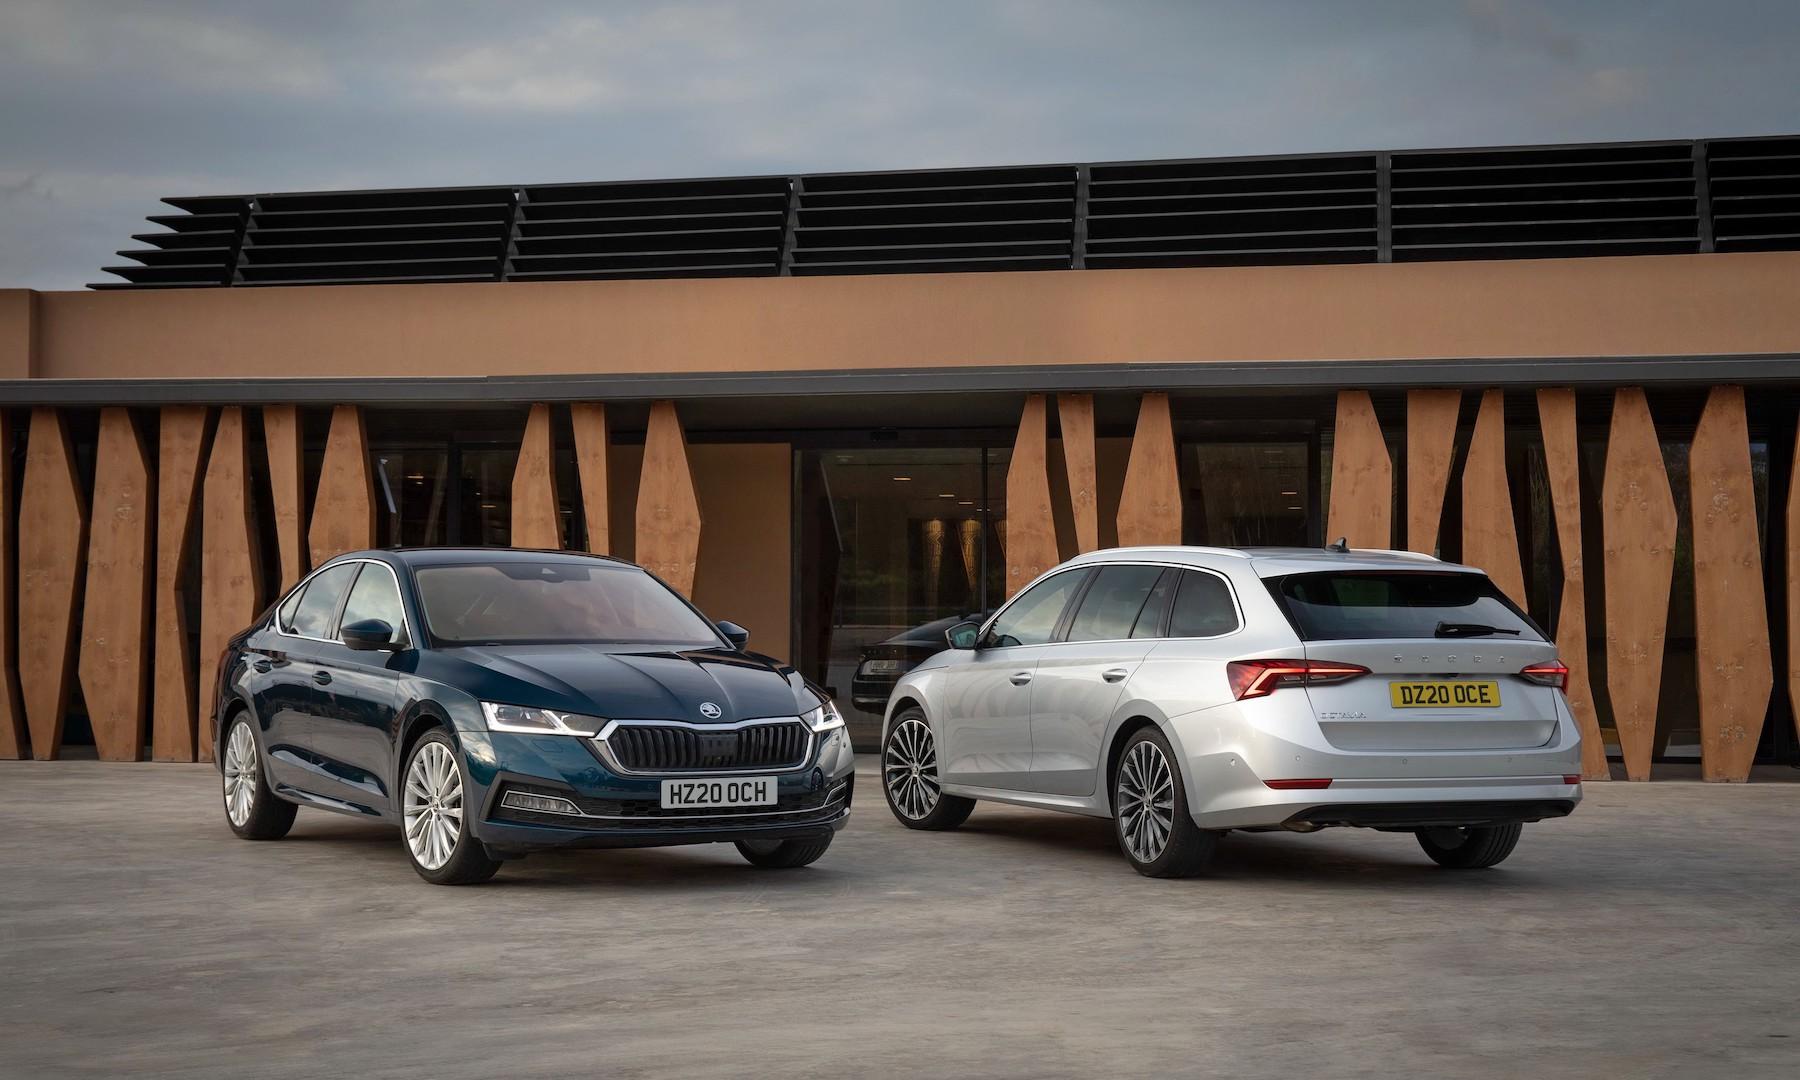 Buyer S Guide To The 2020 Skoda Octavia Car Keys